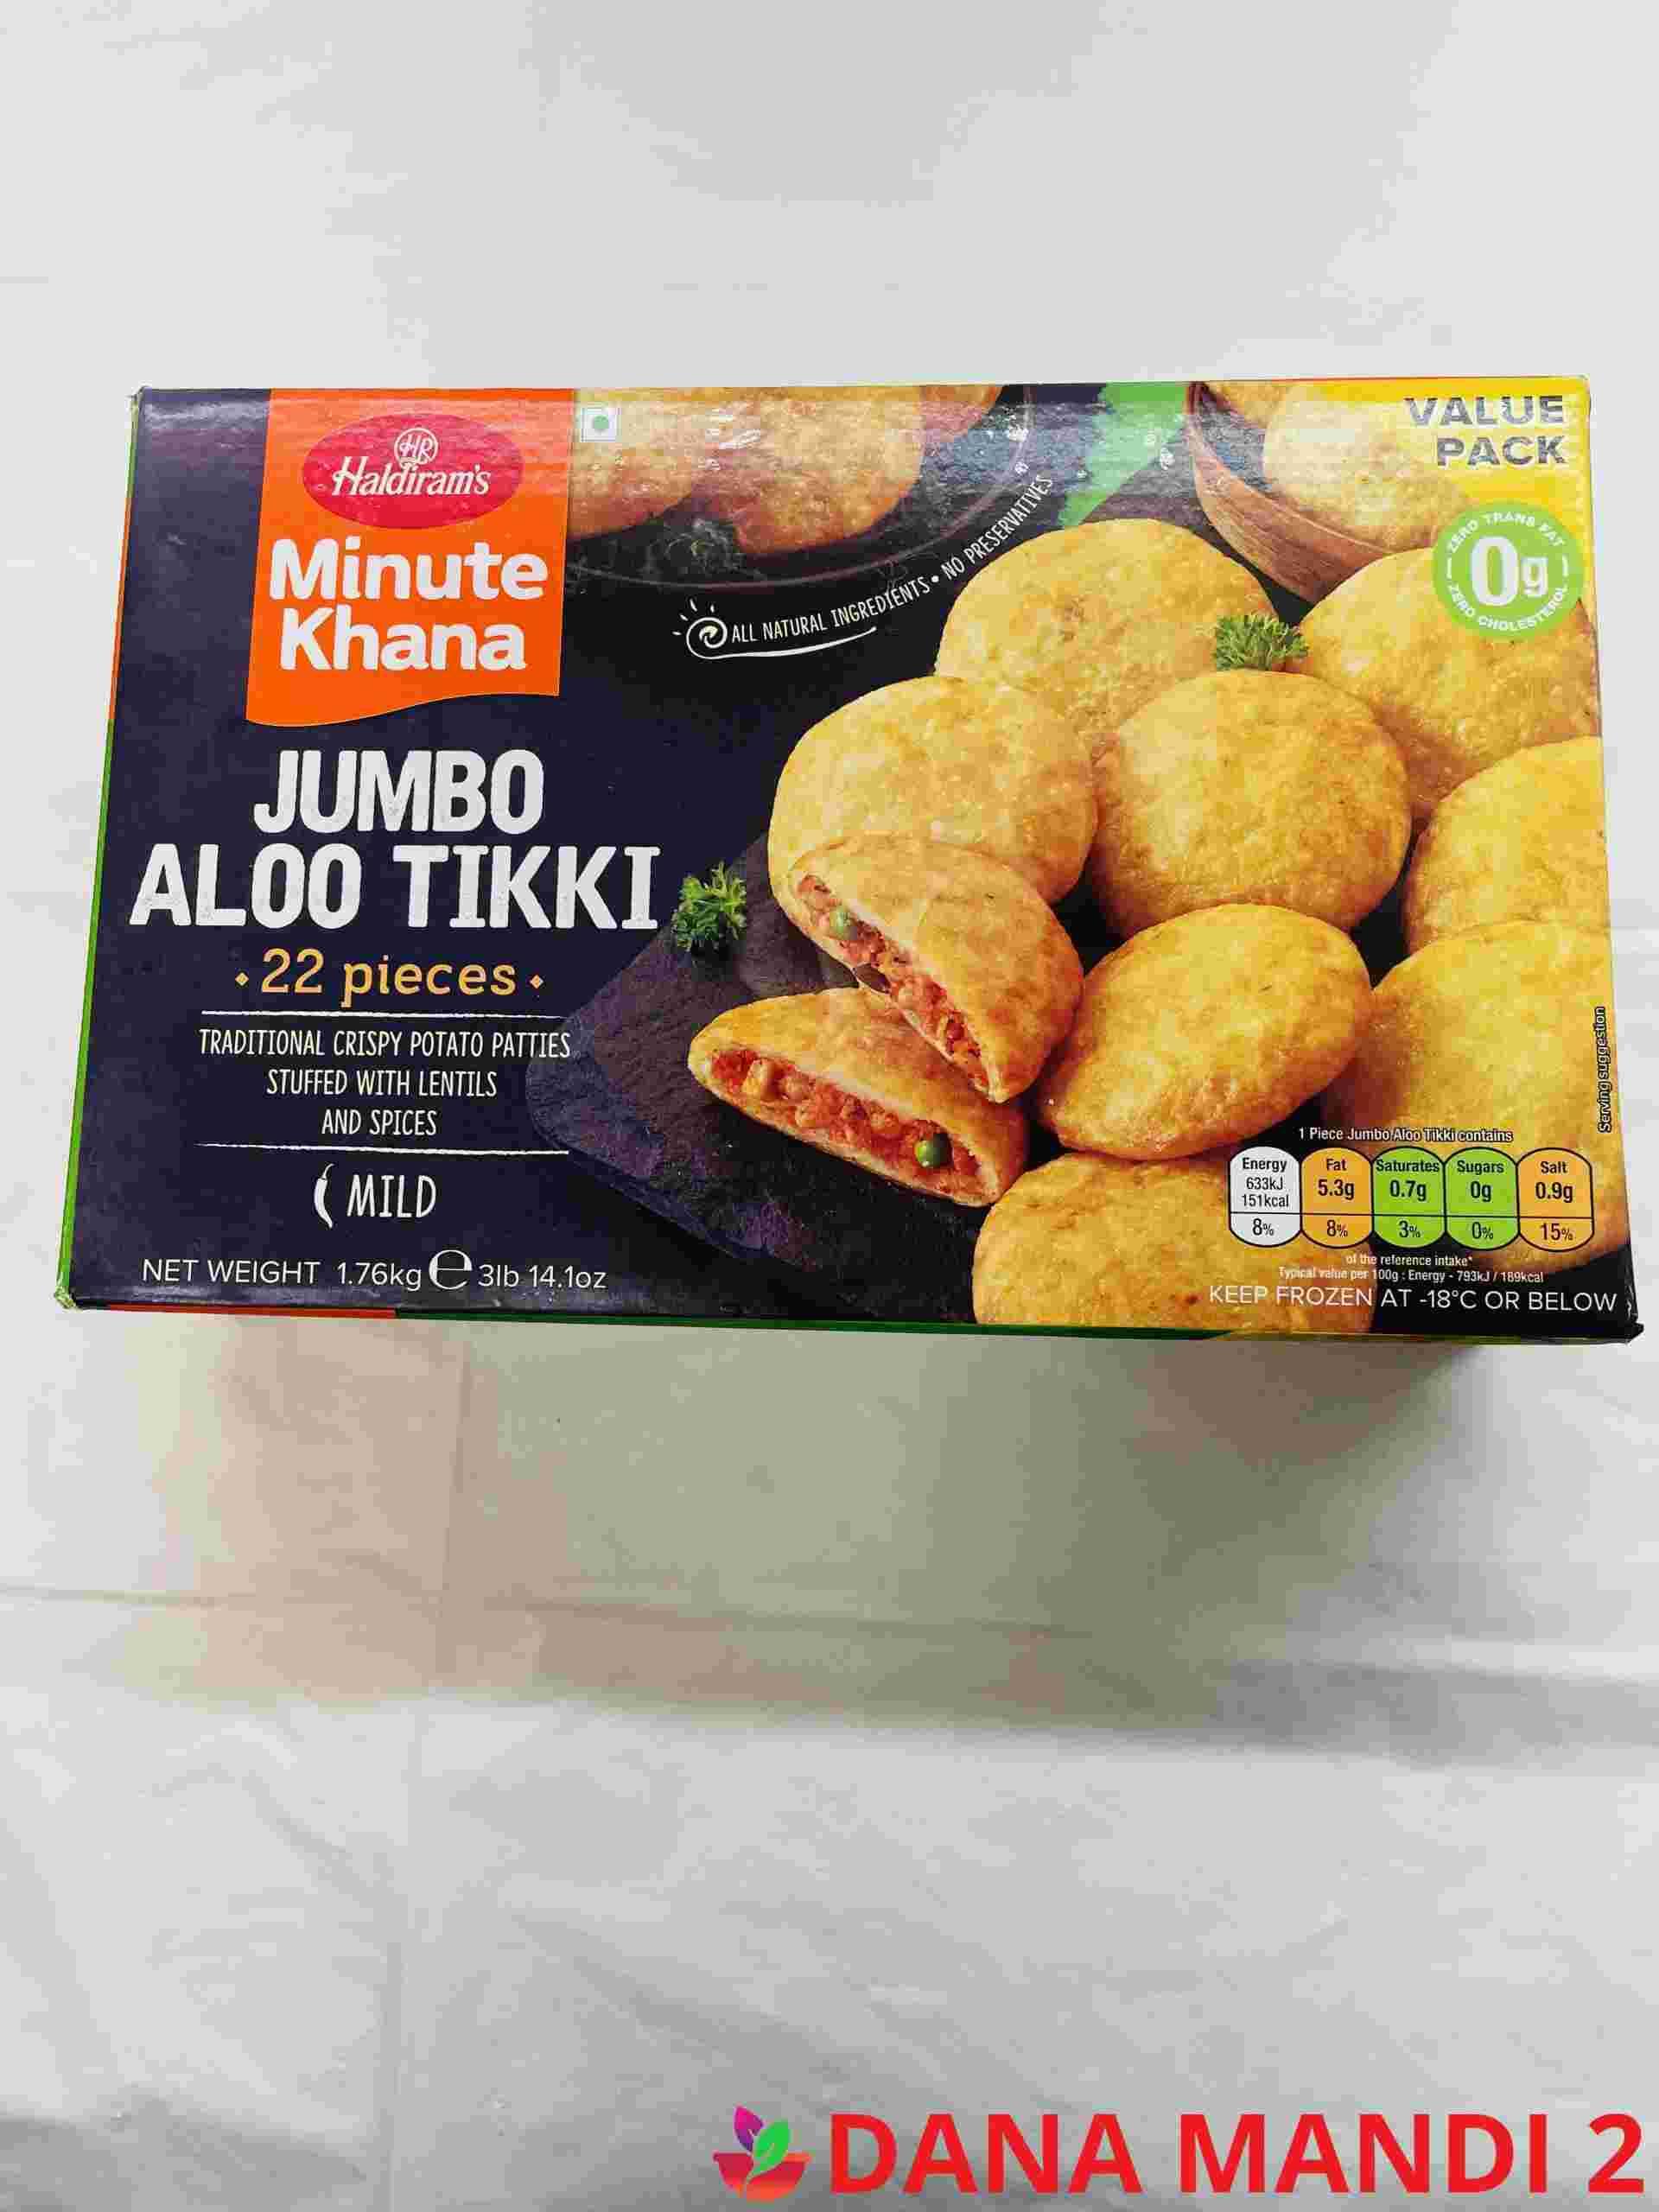 Haldiram's Jumbo Aloo Tikki 22 Pieces